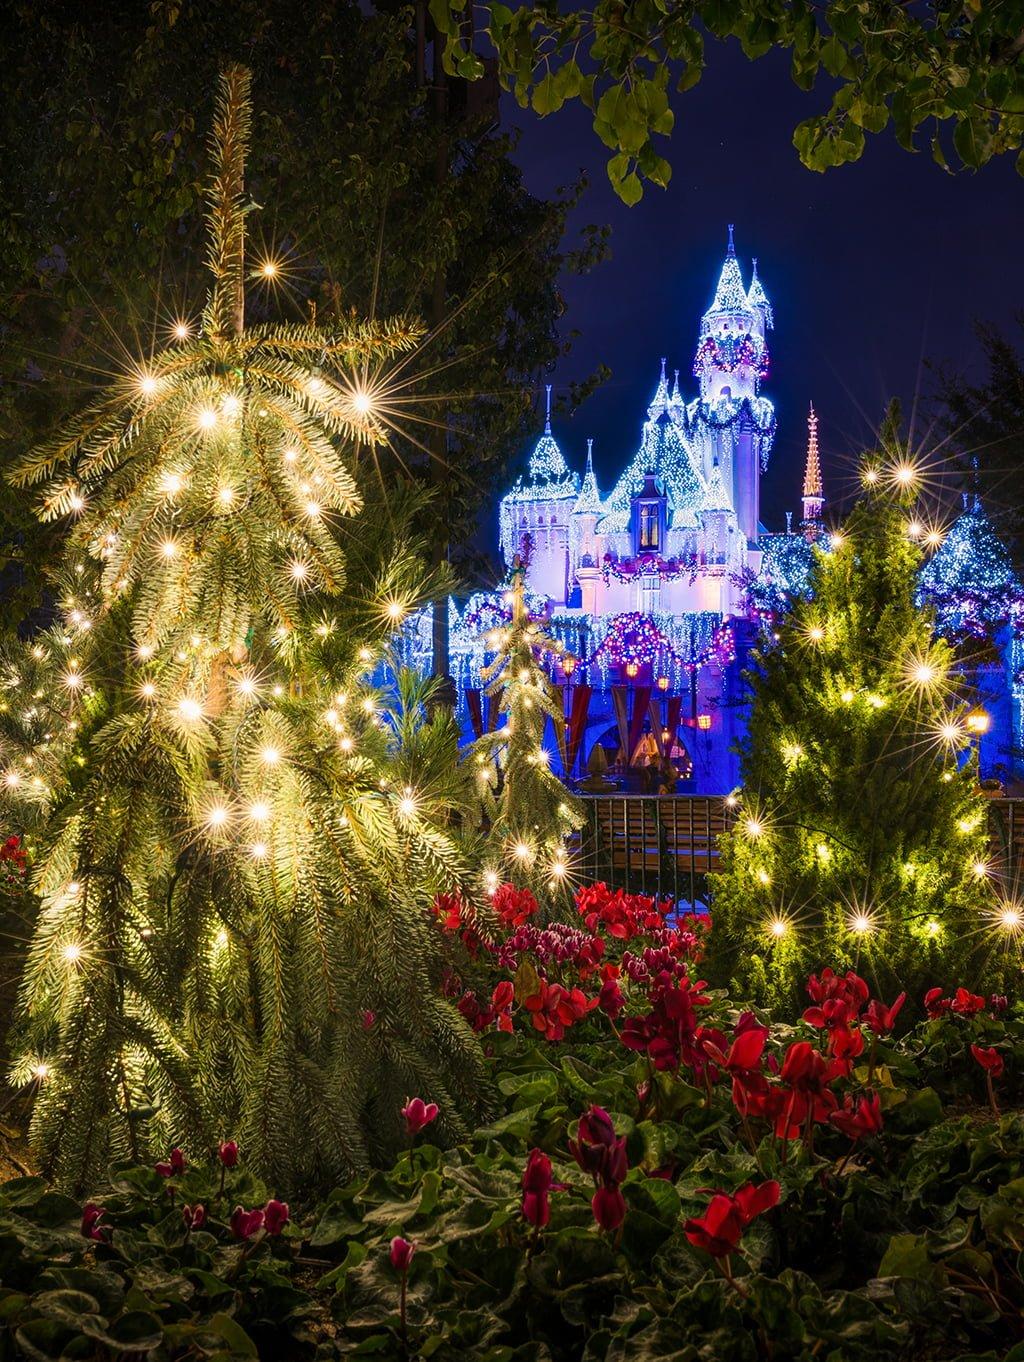 2016 Christmas at Disneyland Update - Disney Tourist Blog